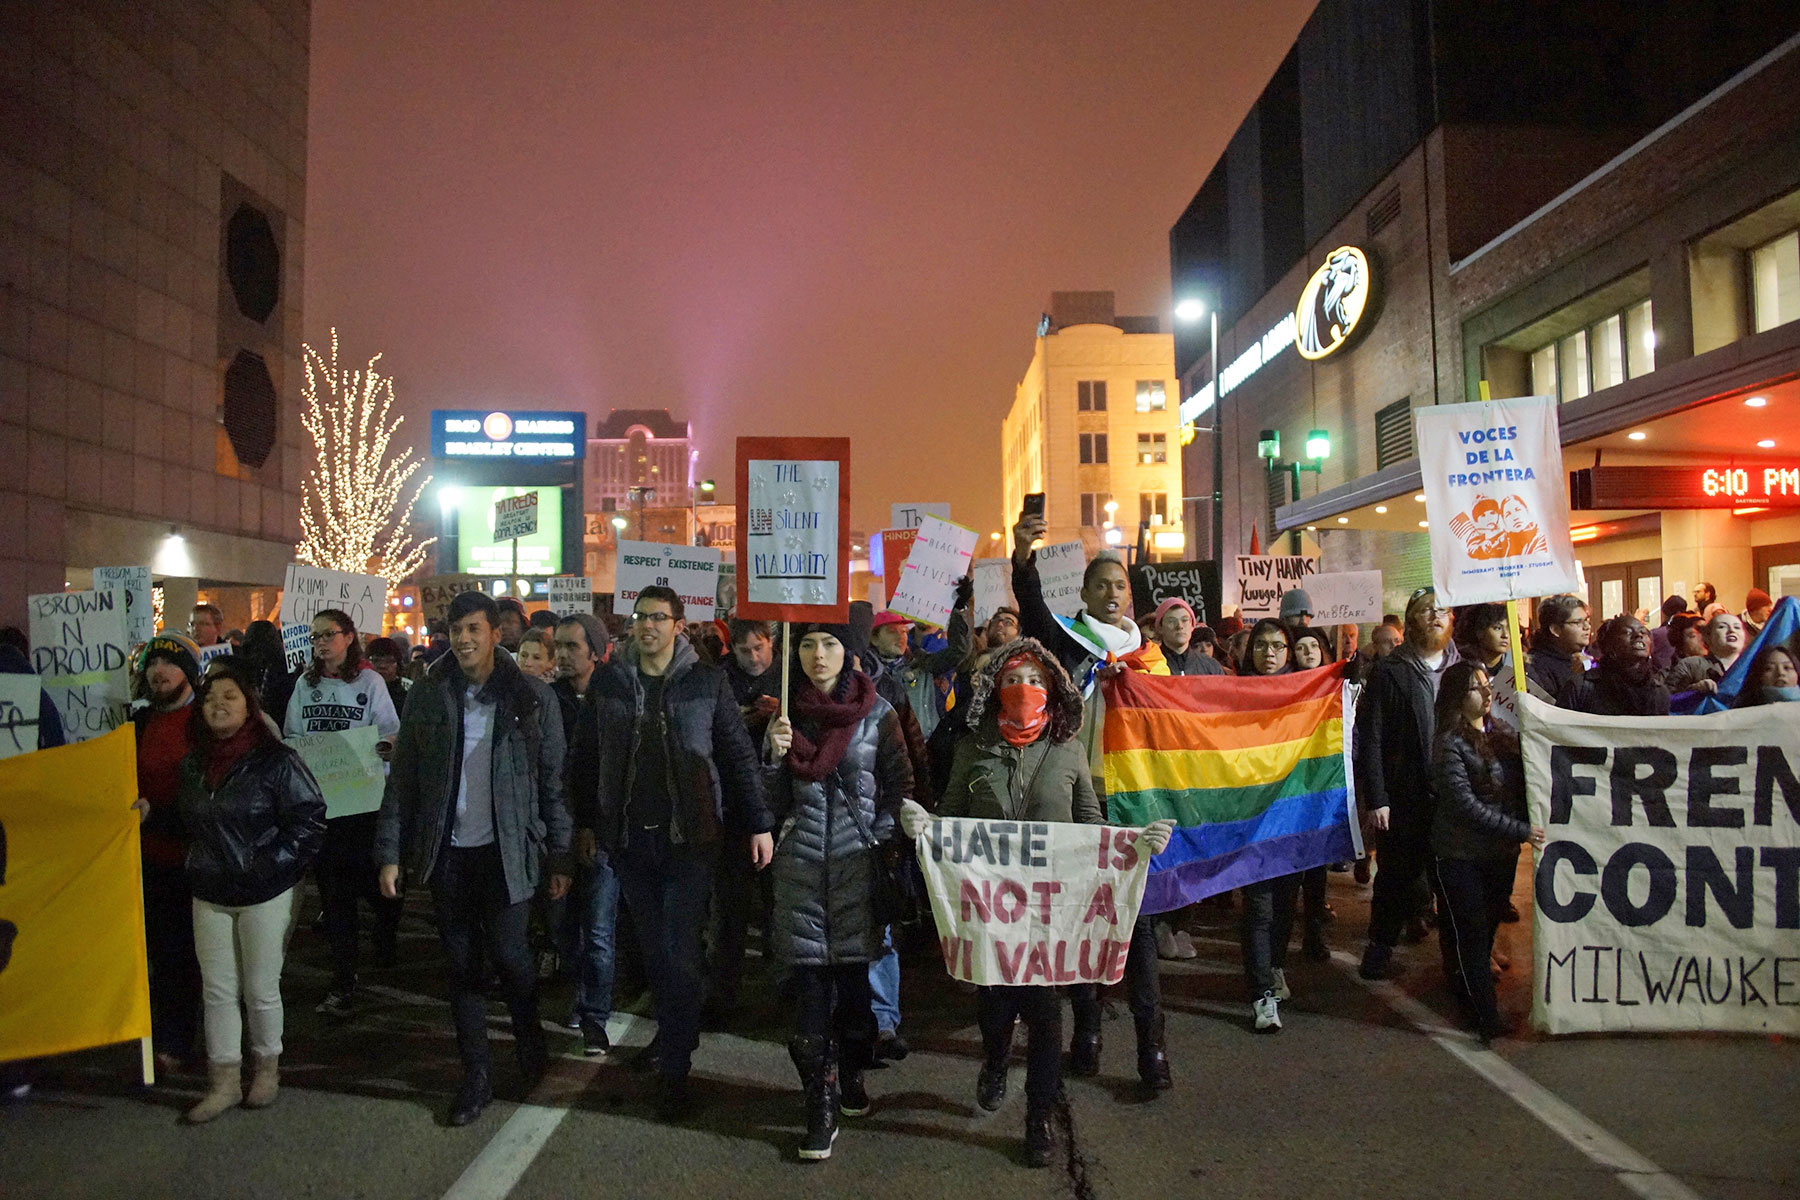 012017_inaugurationprotest_1852p